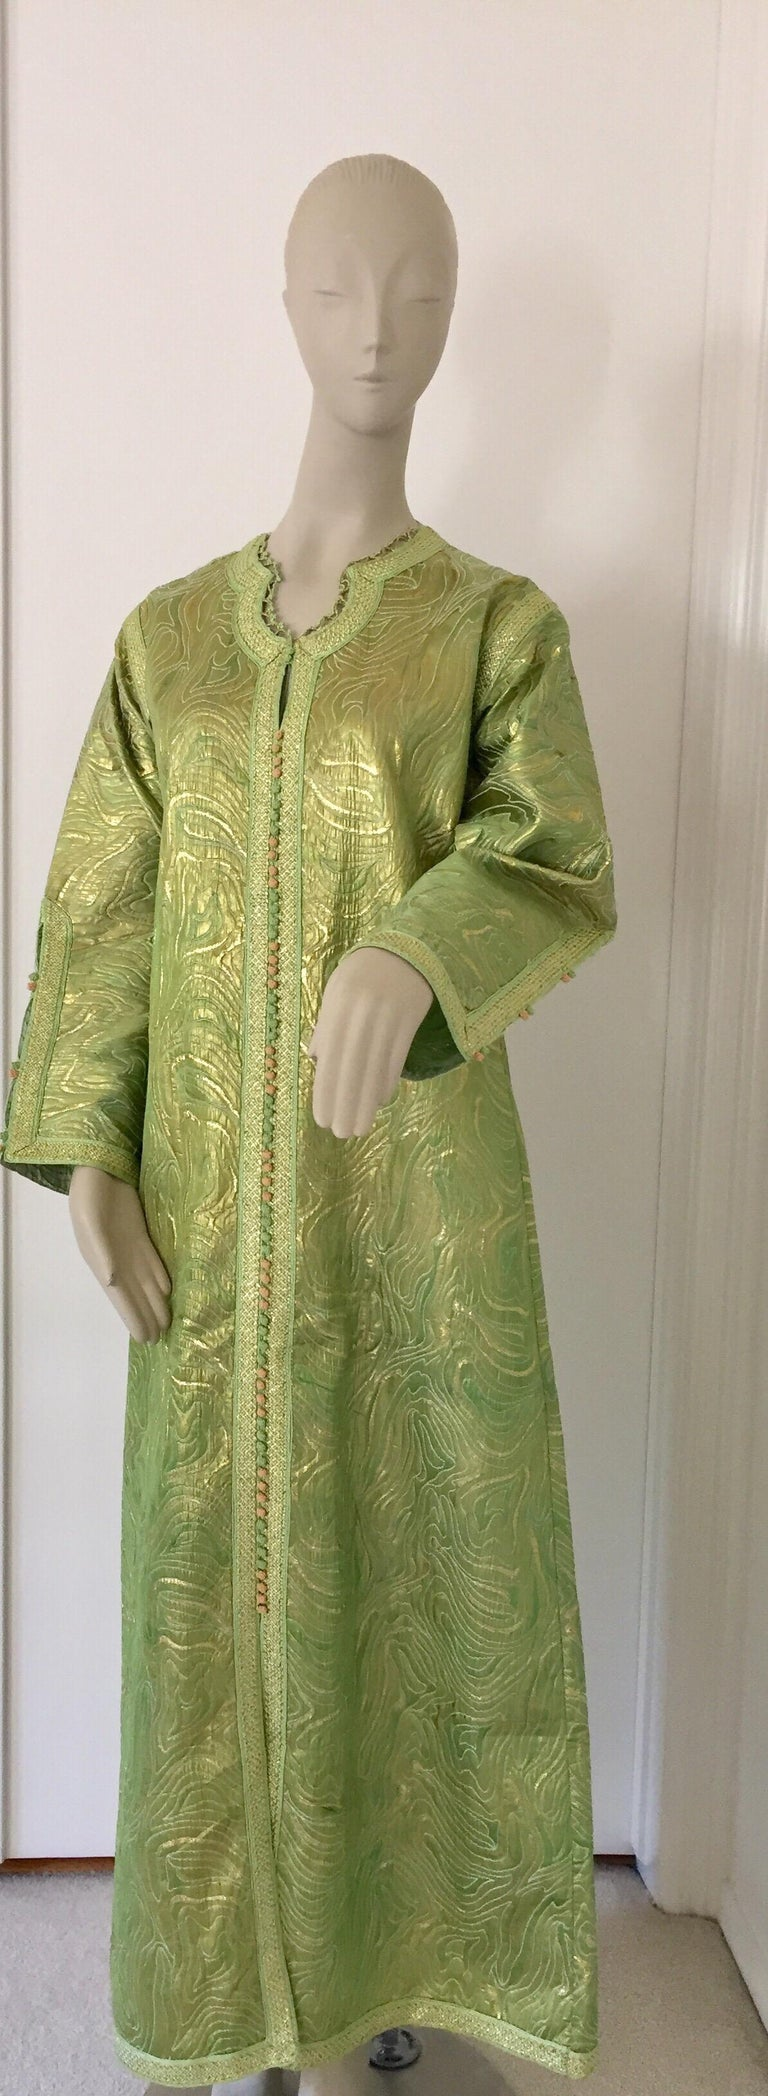 Moroccan Kaftan in Green and Gold Brocade Metallic Lame For Sale 3